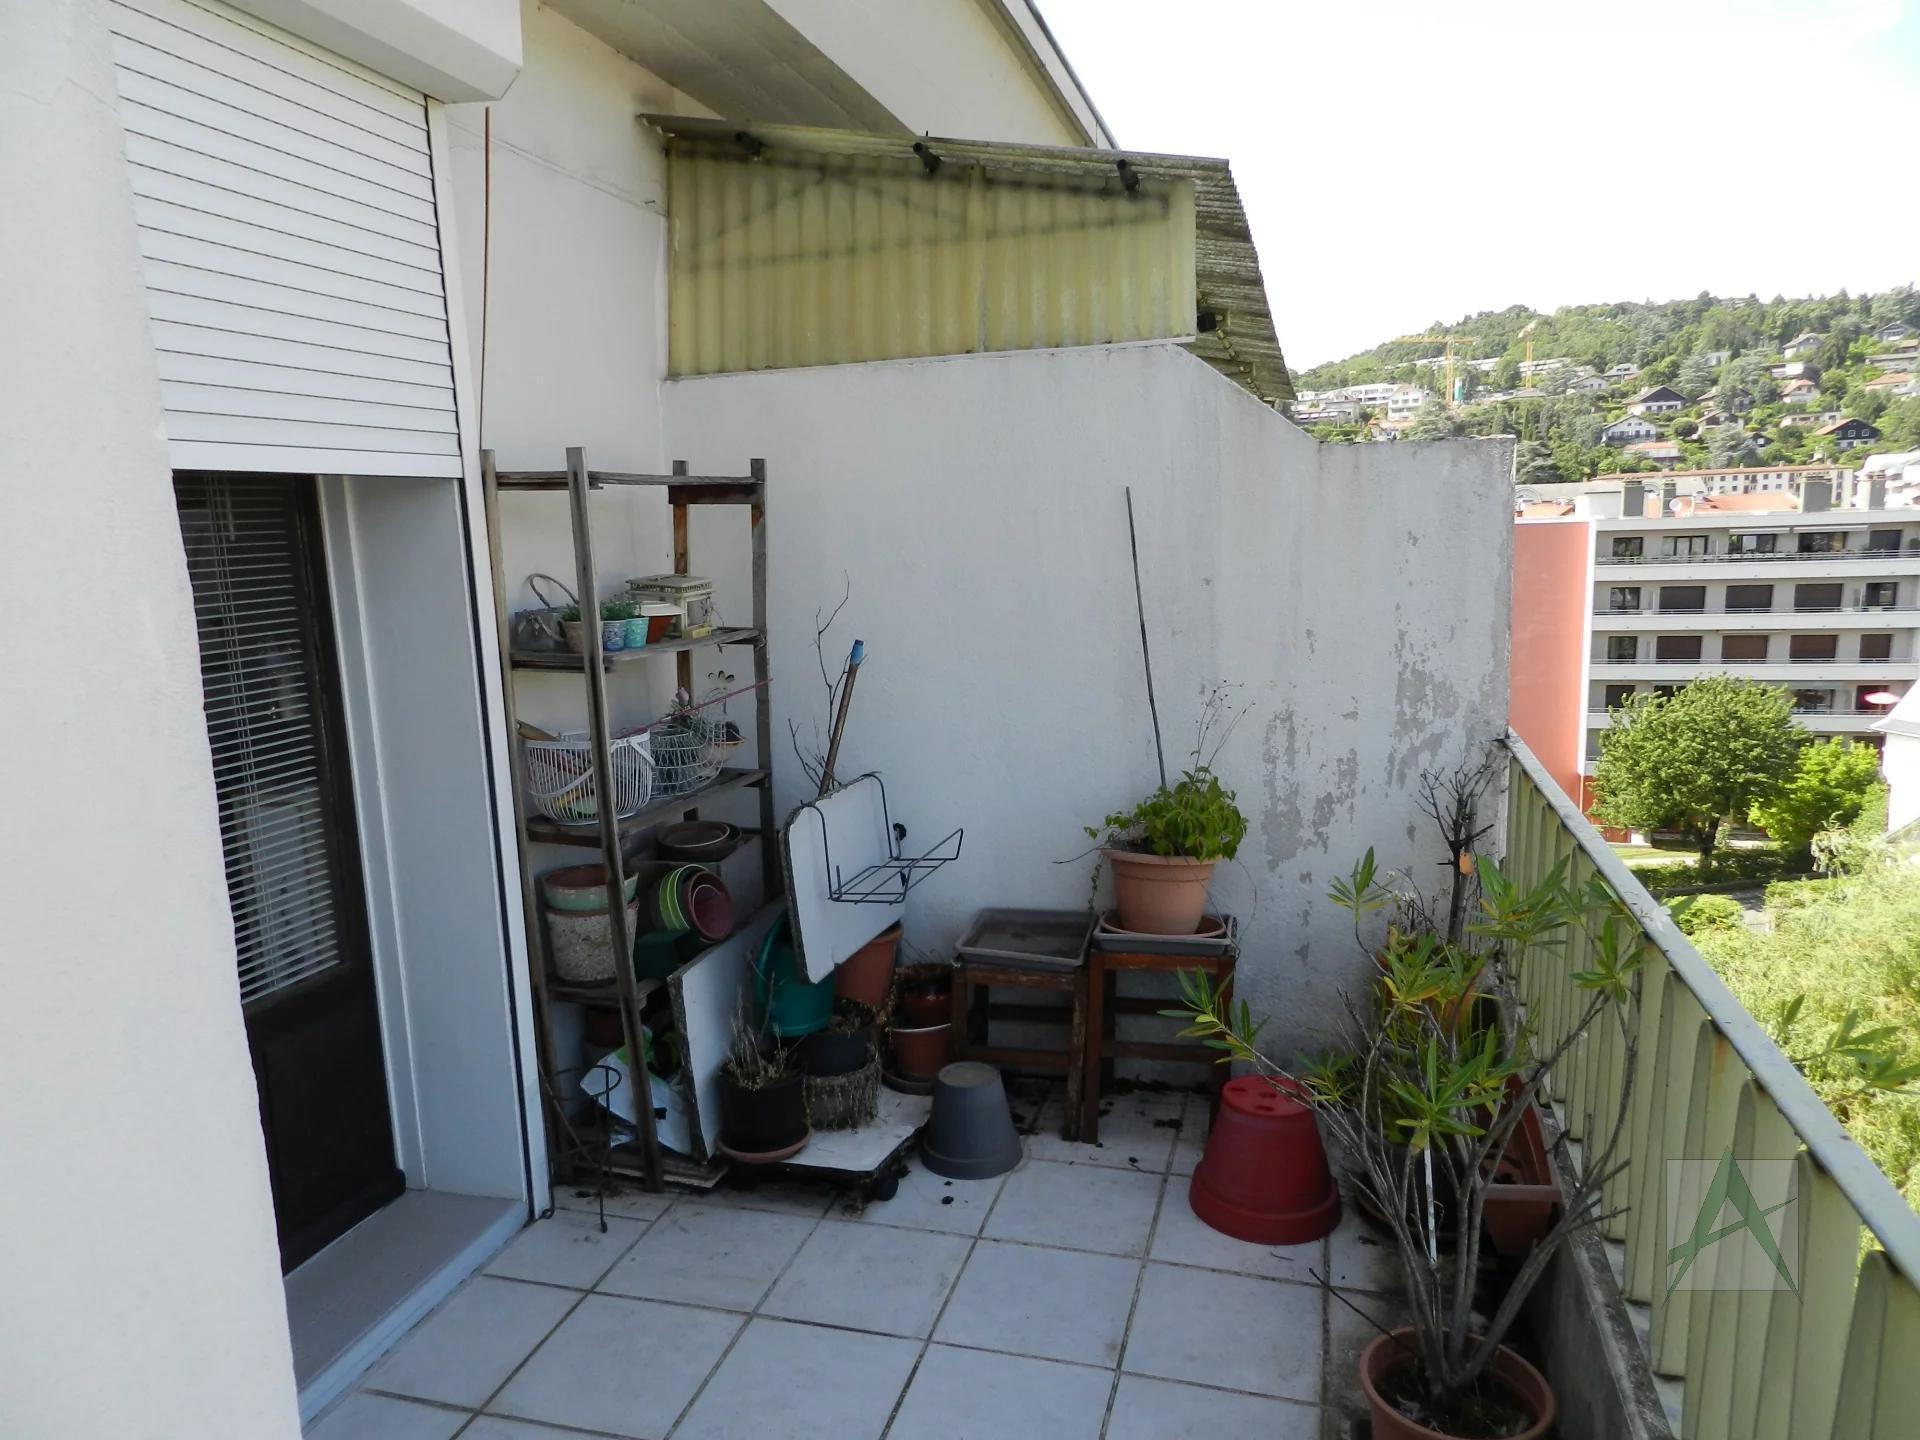 CHAMBERY - T3 avec terrasse pour investisseur